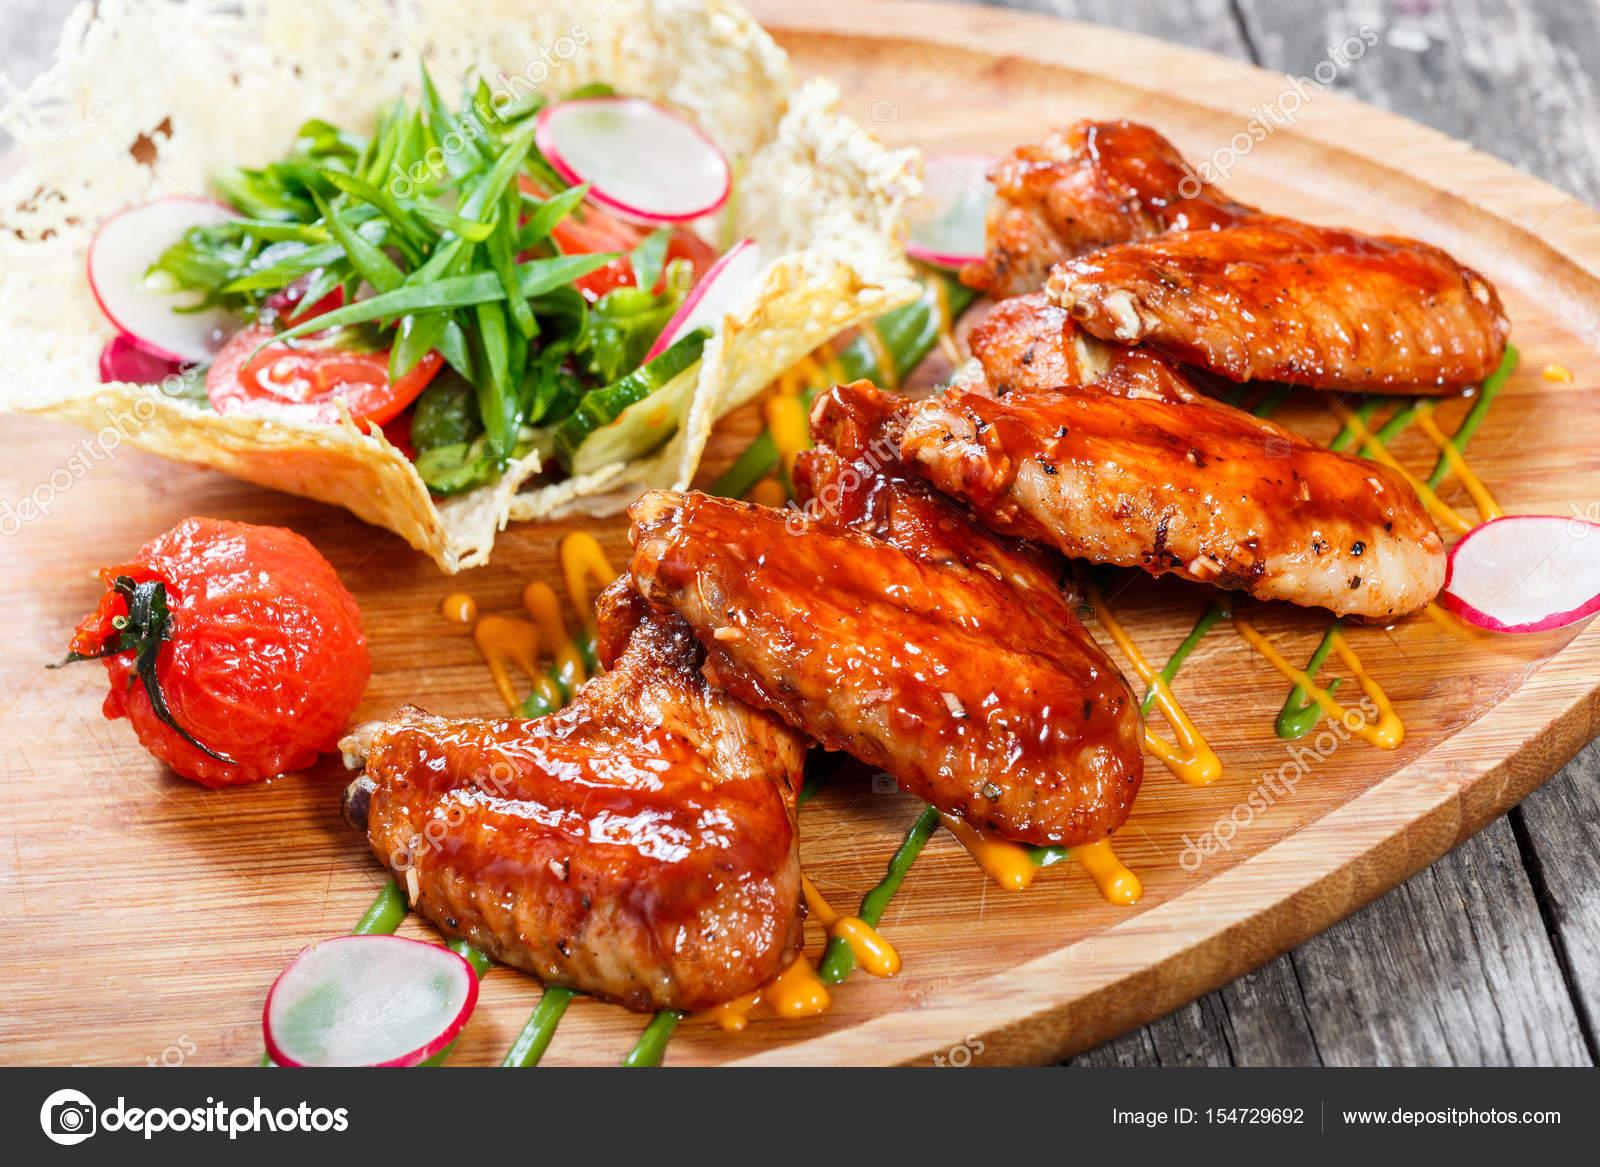 Салат курица барбекю электрокамин цены в ростове